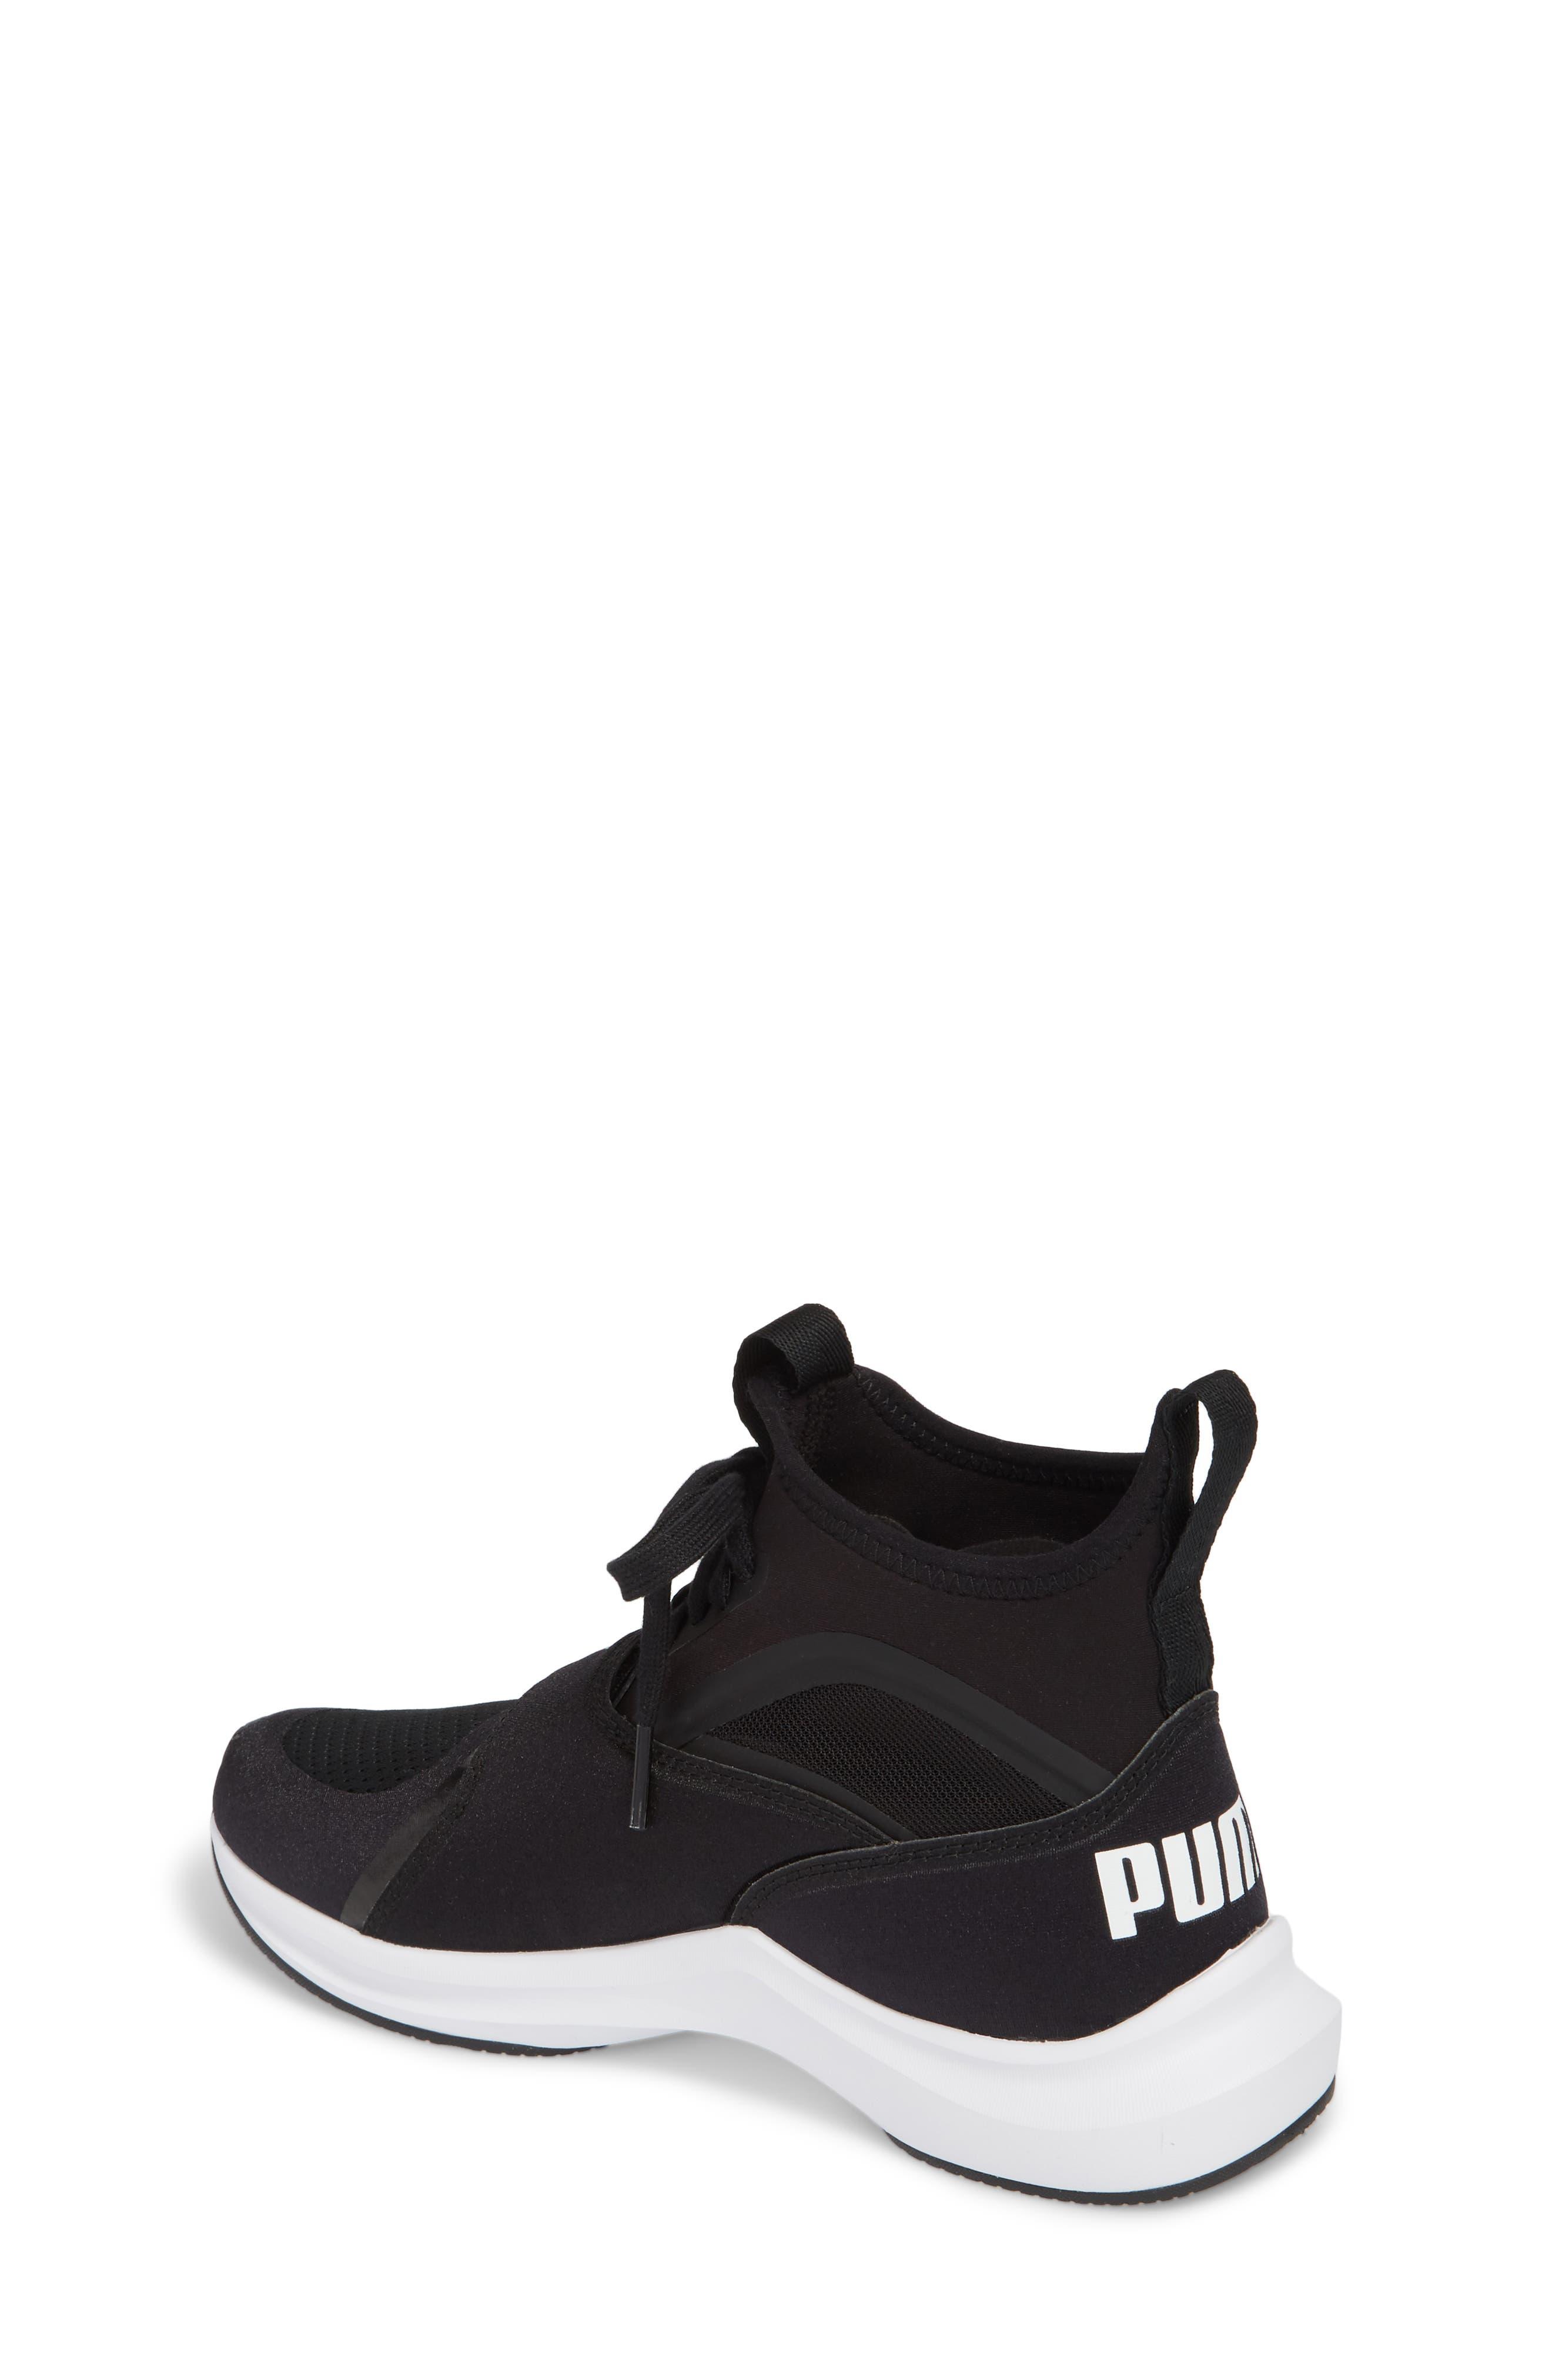 Phenom Jr High Top Sneaker,                             Alternate thumbnail 2, color,                             001